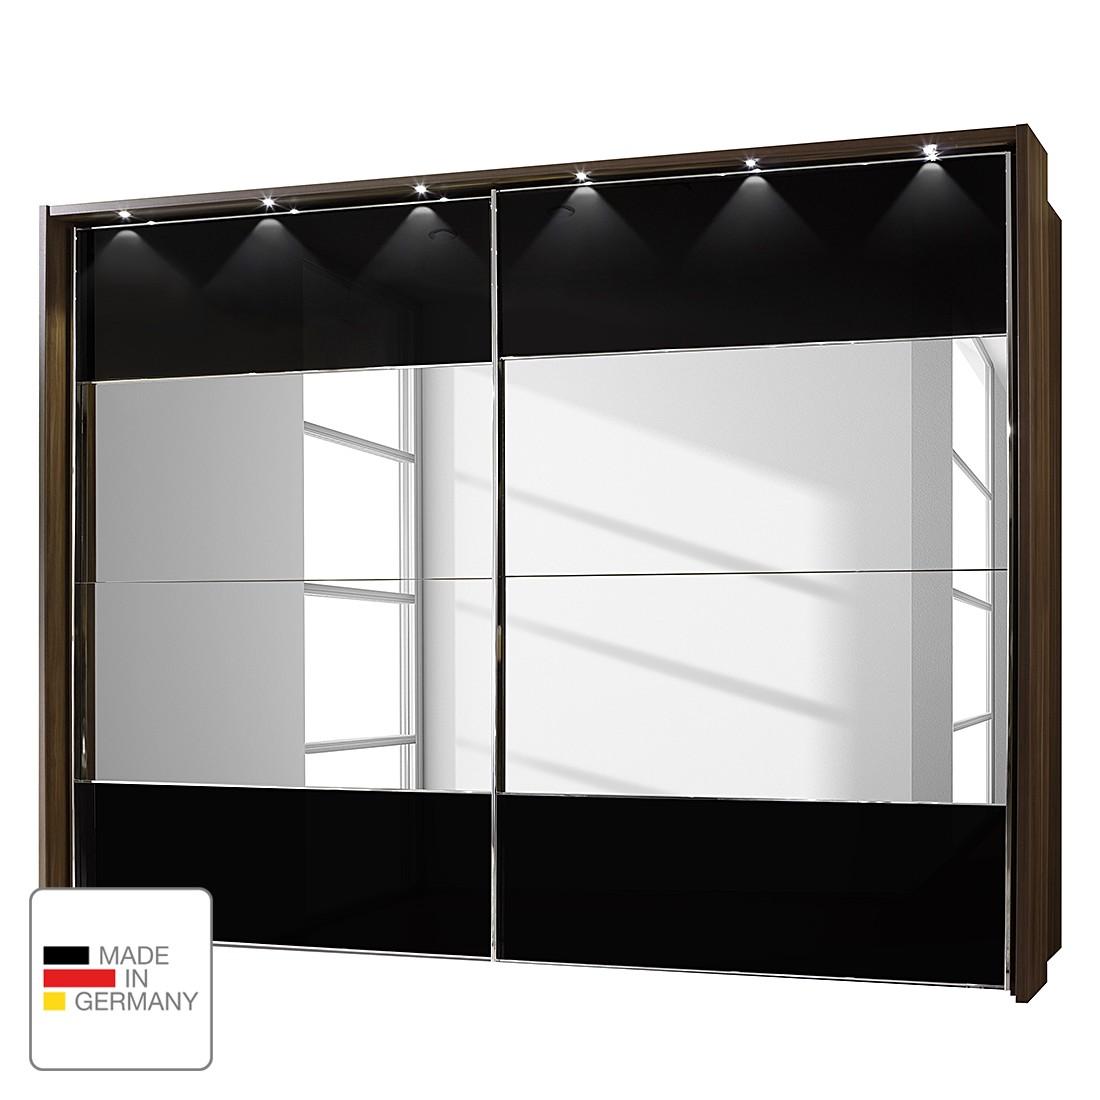 EEK A+, Schwebetürenschrank Monza - Walnuss Dekor/Schwarzglas - LED-Beleuchtung - 250 cm (3-türig) - 216 cm - Mit beleuchtetem Passepartout, Althoff